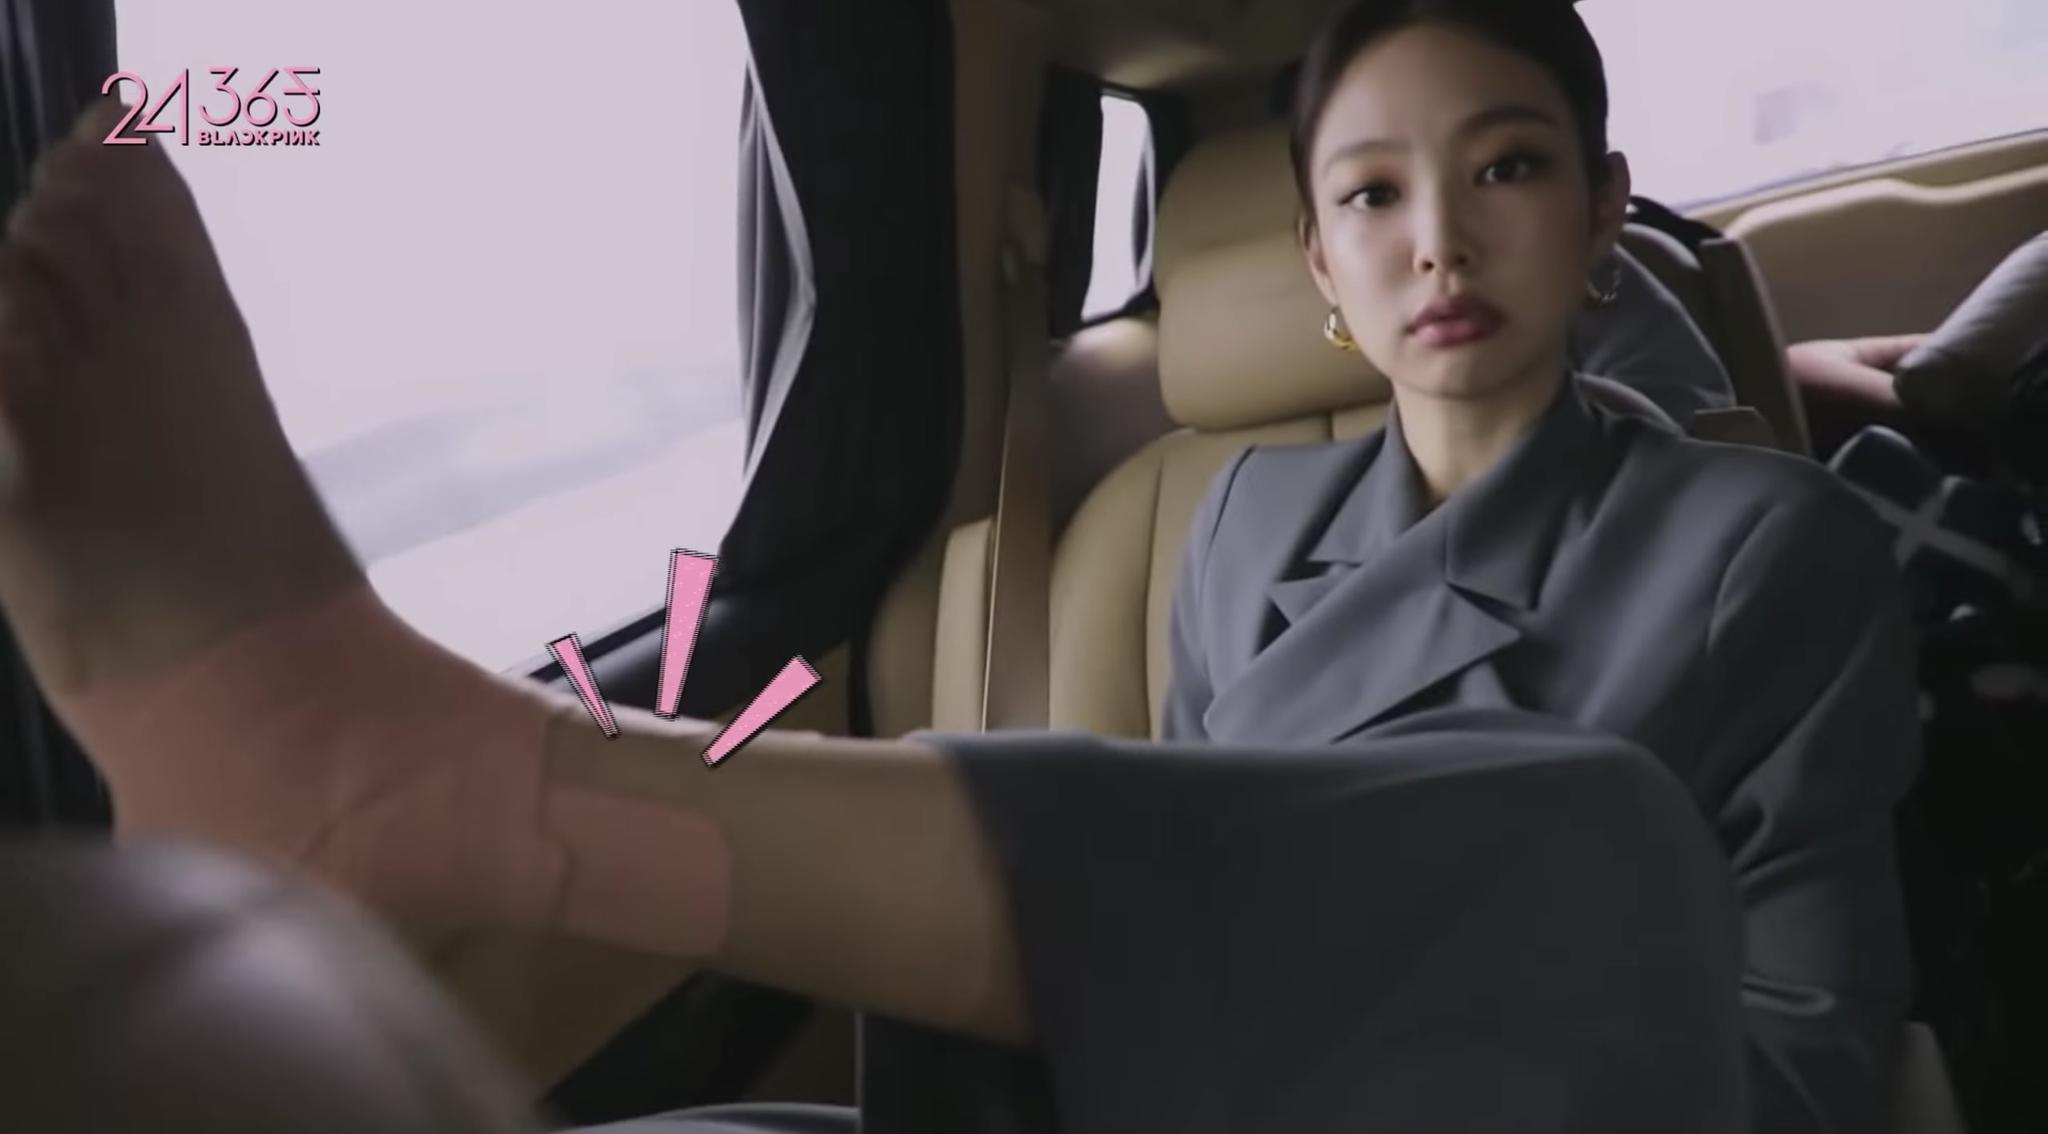 BLACKPINK金智妮在新的真人秀节目中担心脚踝伤势和回归发型